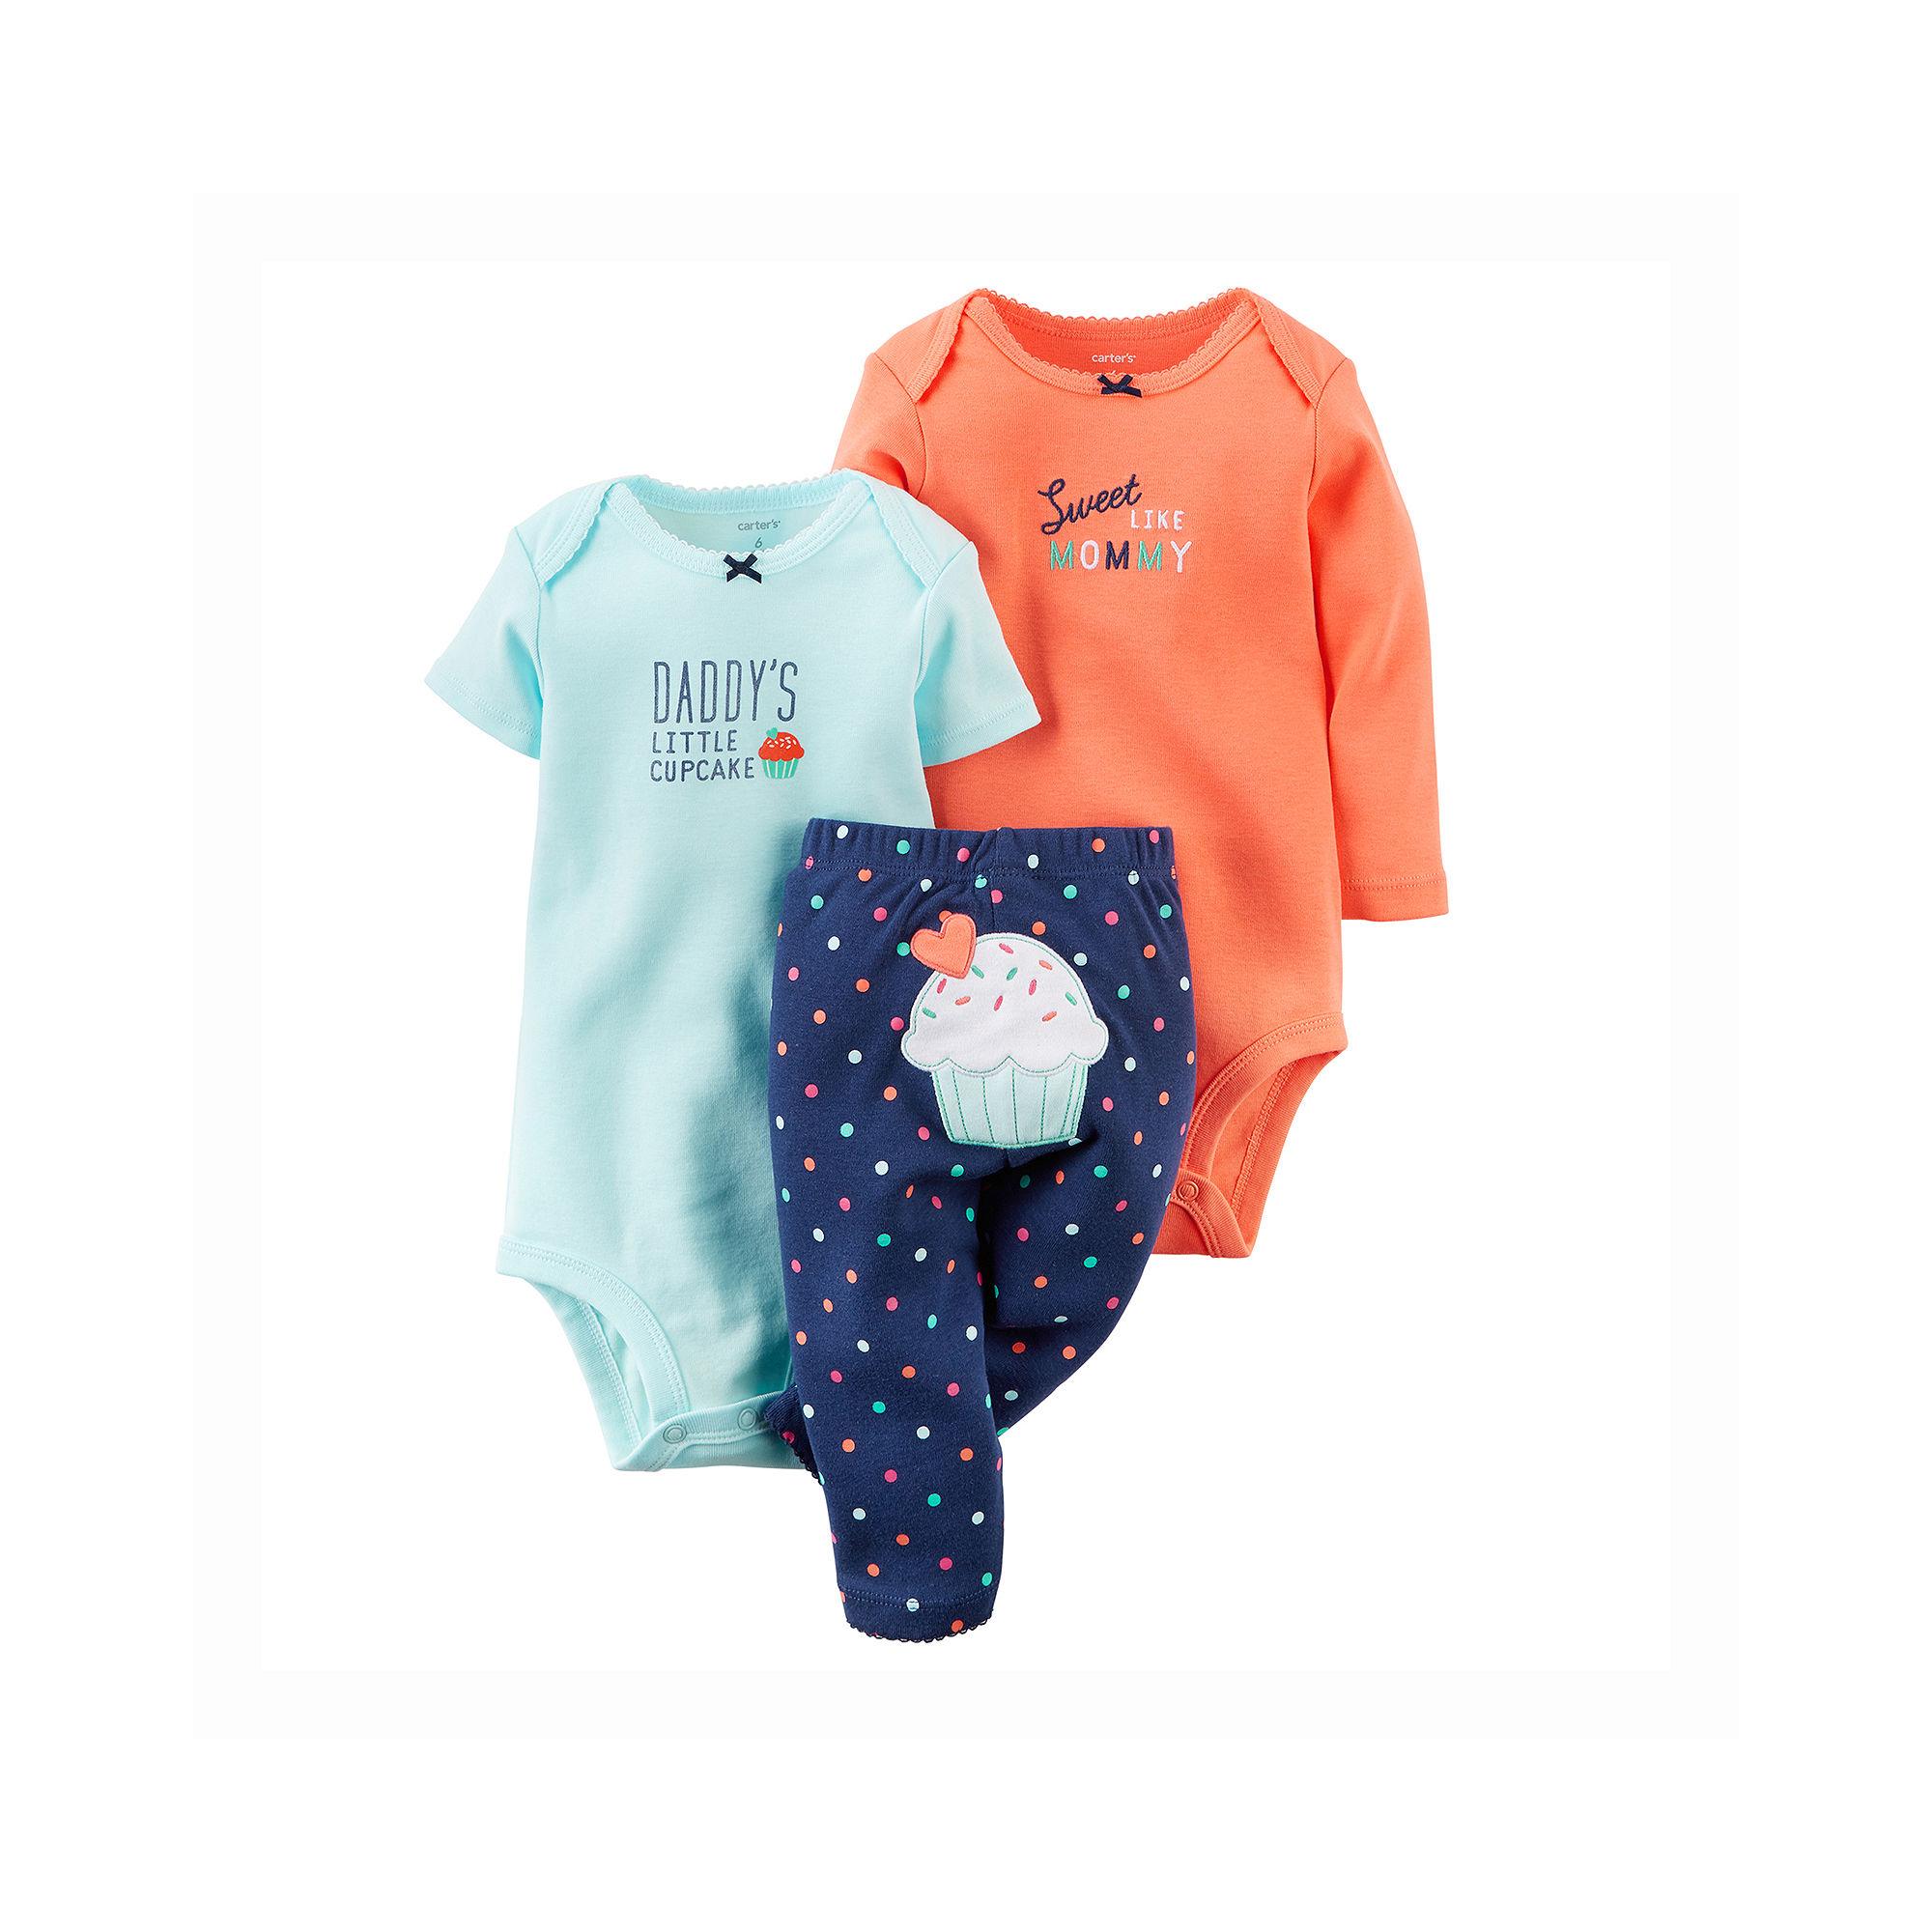 7f3da51589ad UPC 888510756033 - Carter s 3-pc. Bodysuits and Pants Set - Baby ...